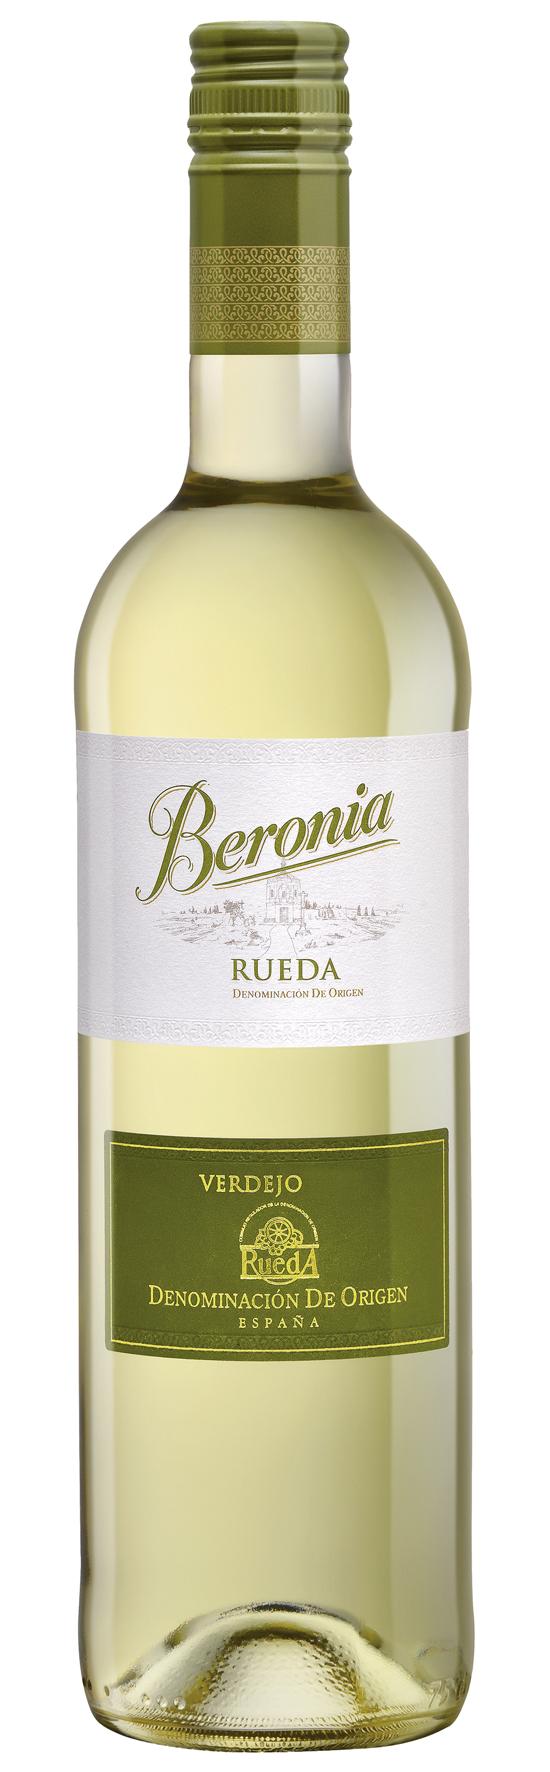 Beronia Verdejo 2015 Bodegas Beronia DO Rueda